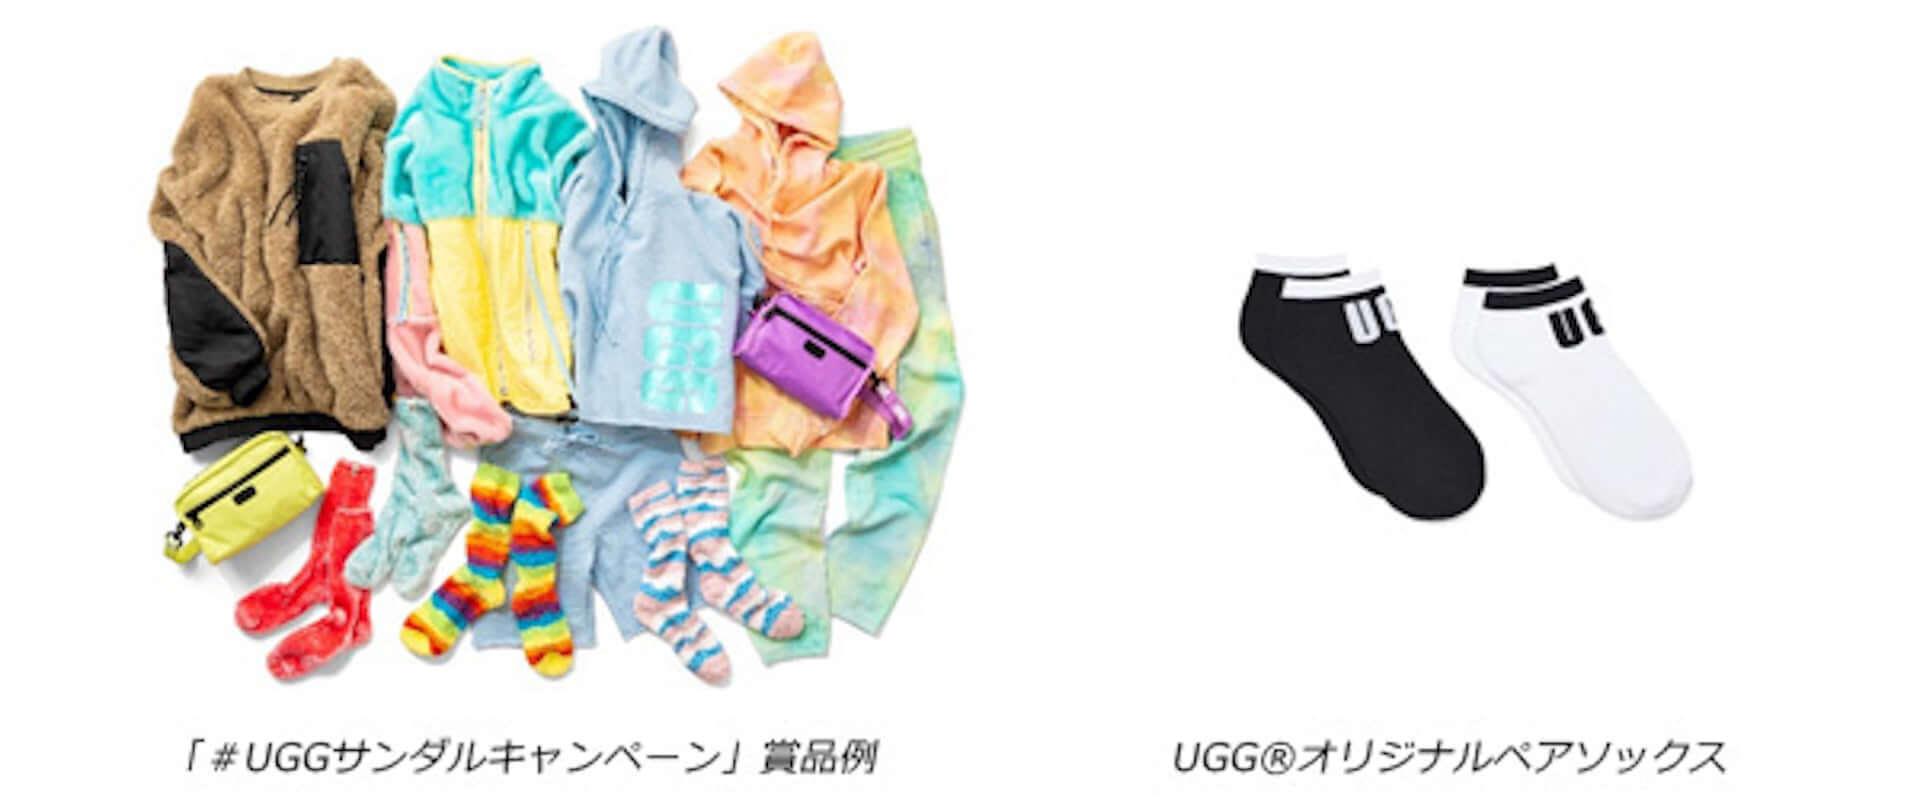 UGGの人気サンダル『Fluff』がアップデート!2021春夏の新作コレクションが発表&SNSキャンペーンも実施中 lf210303_ugg_4-1920x803